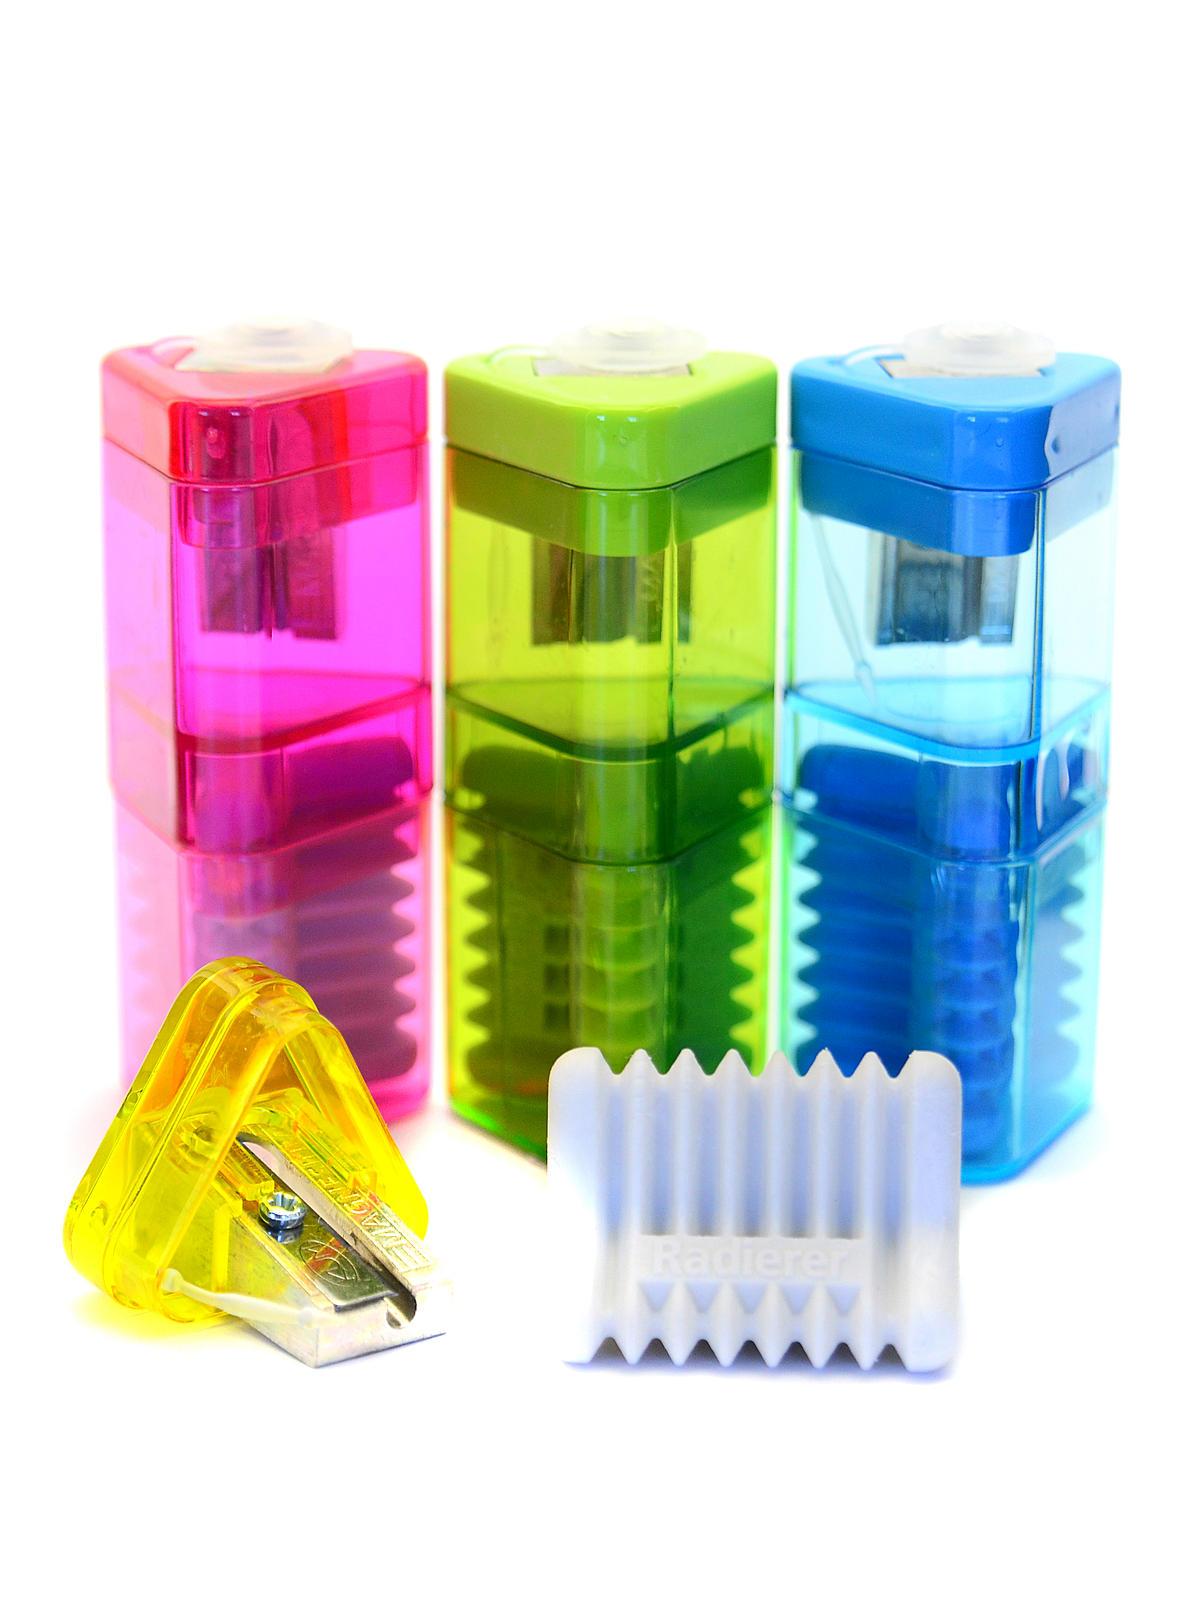 Correc-Tri Sharpener and Eraser